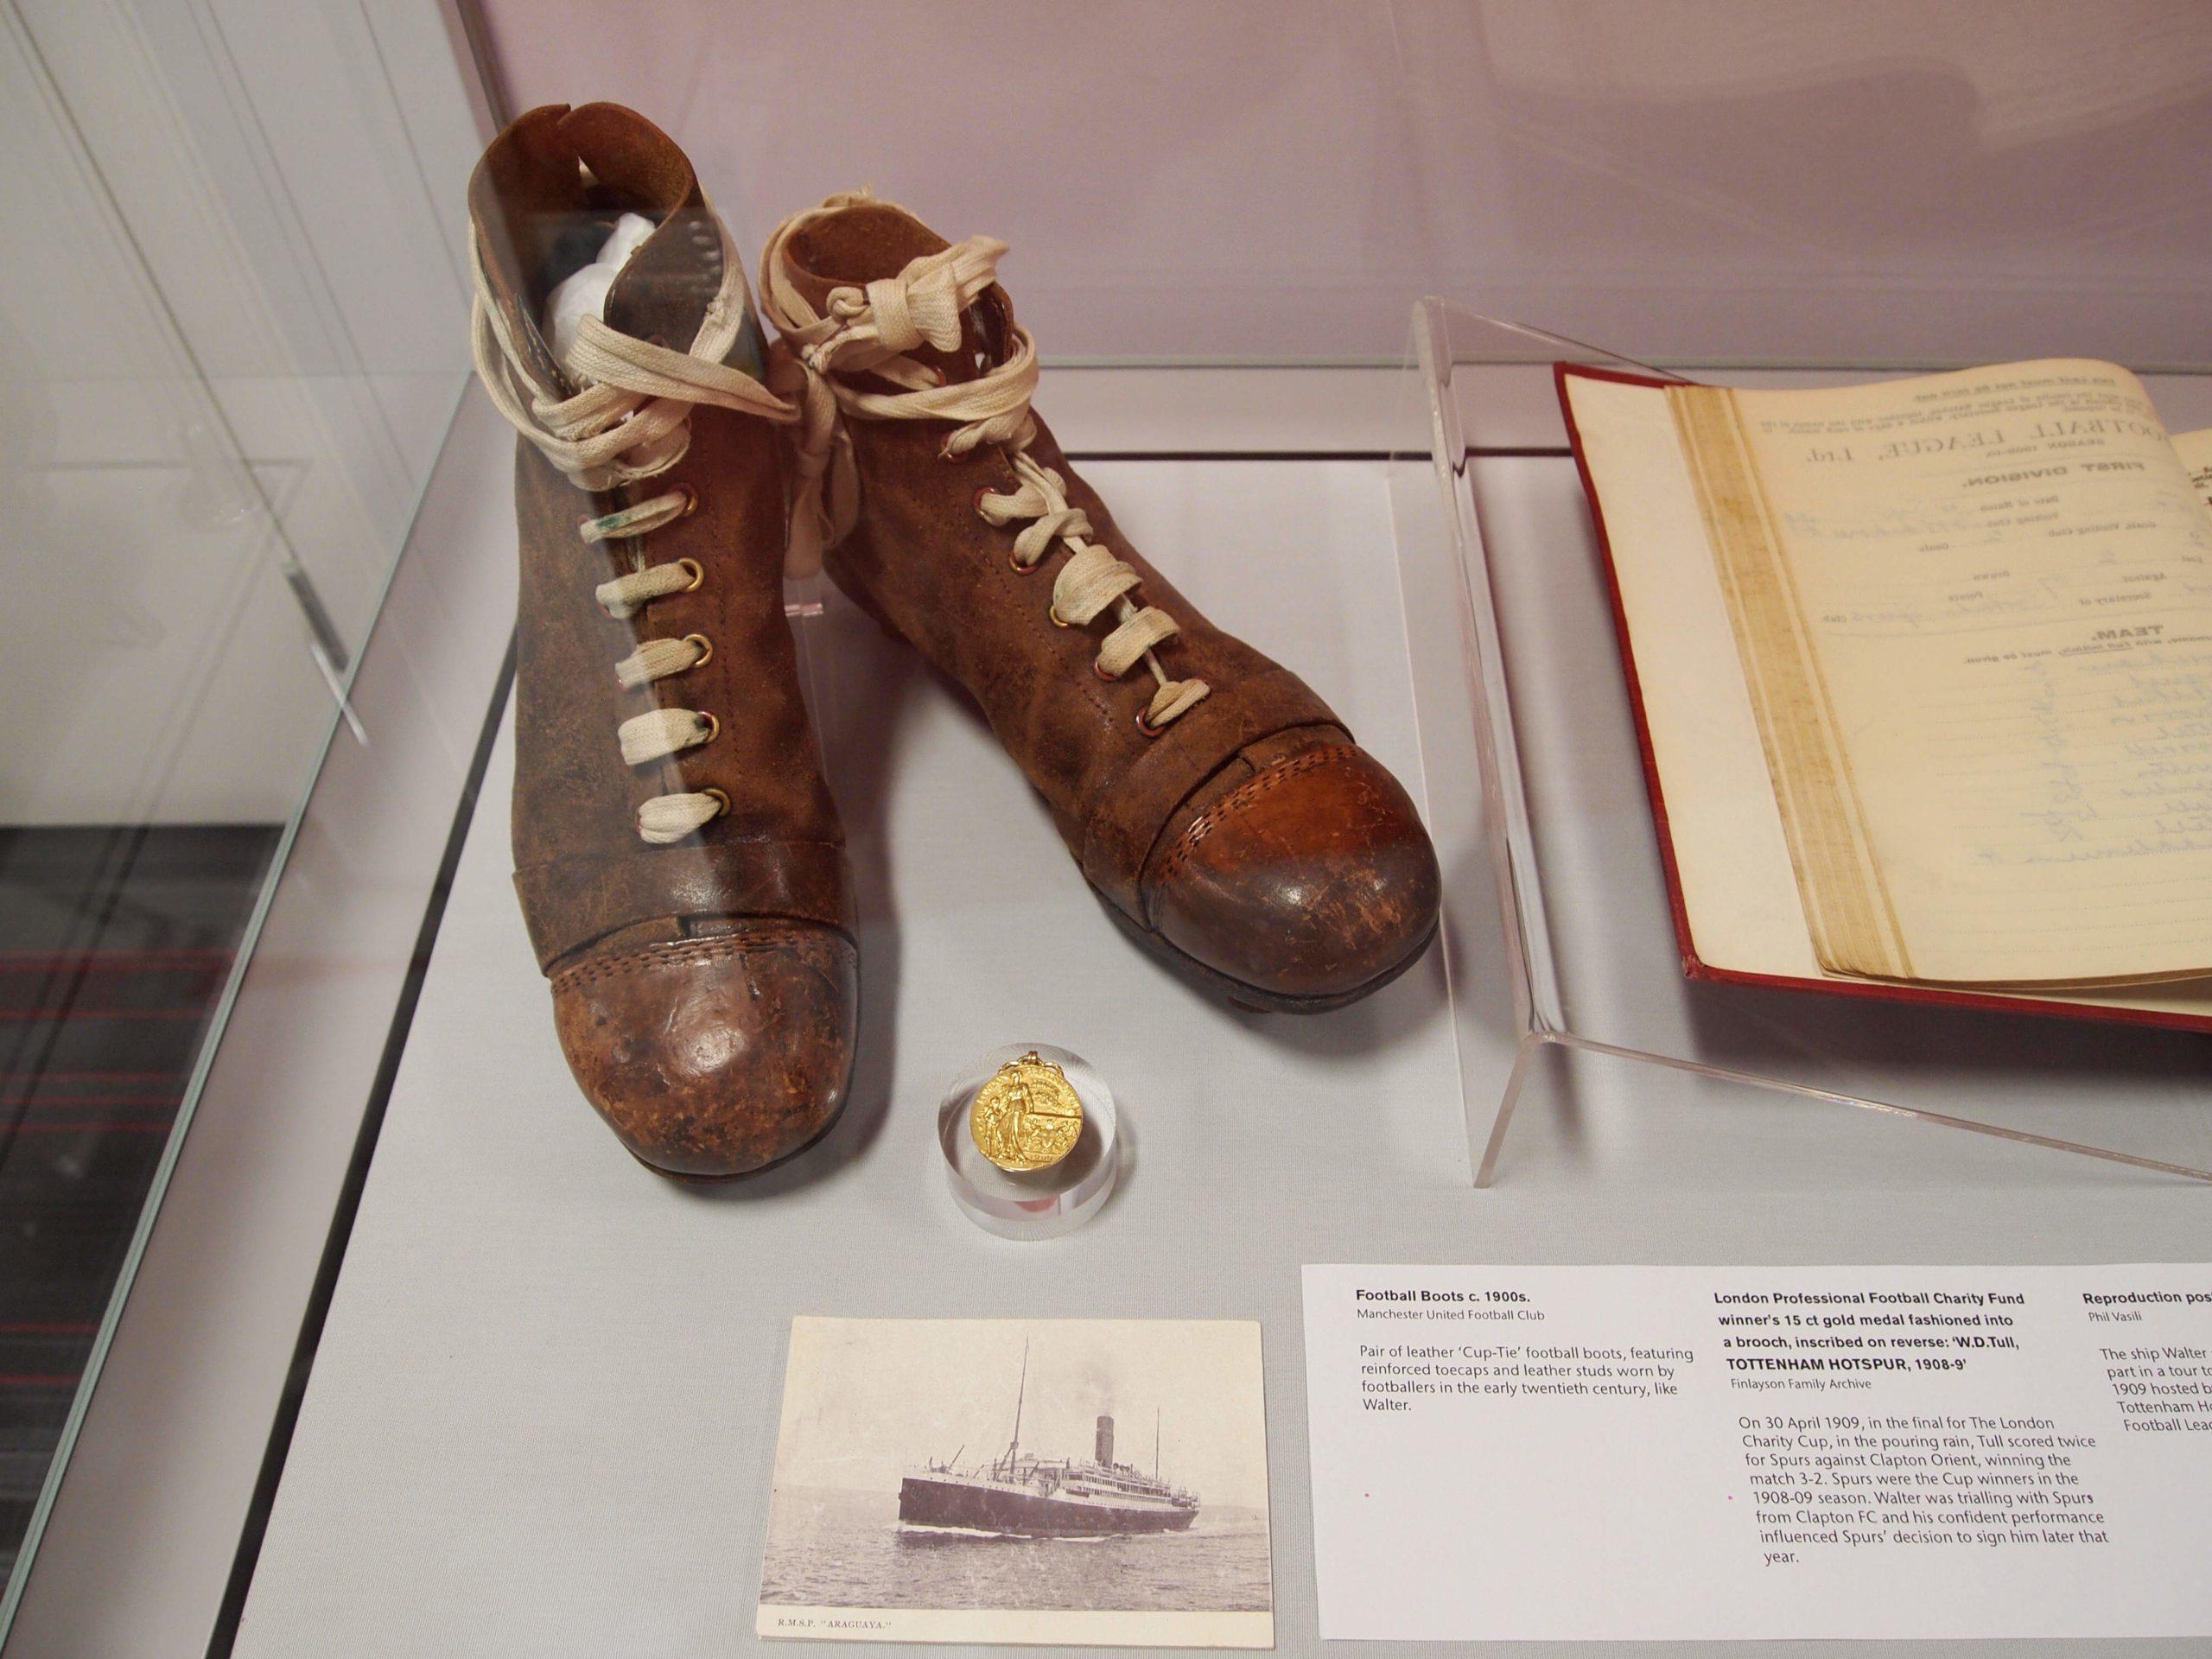 Walter Tull Football Boots